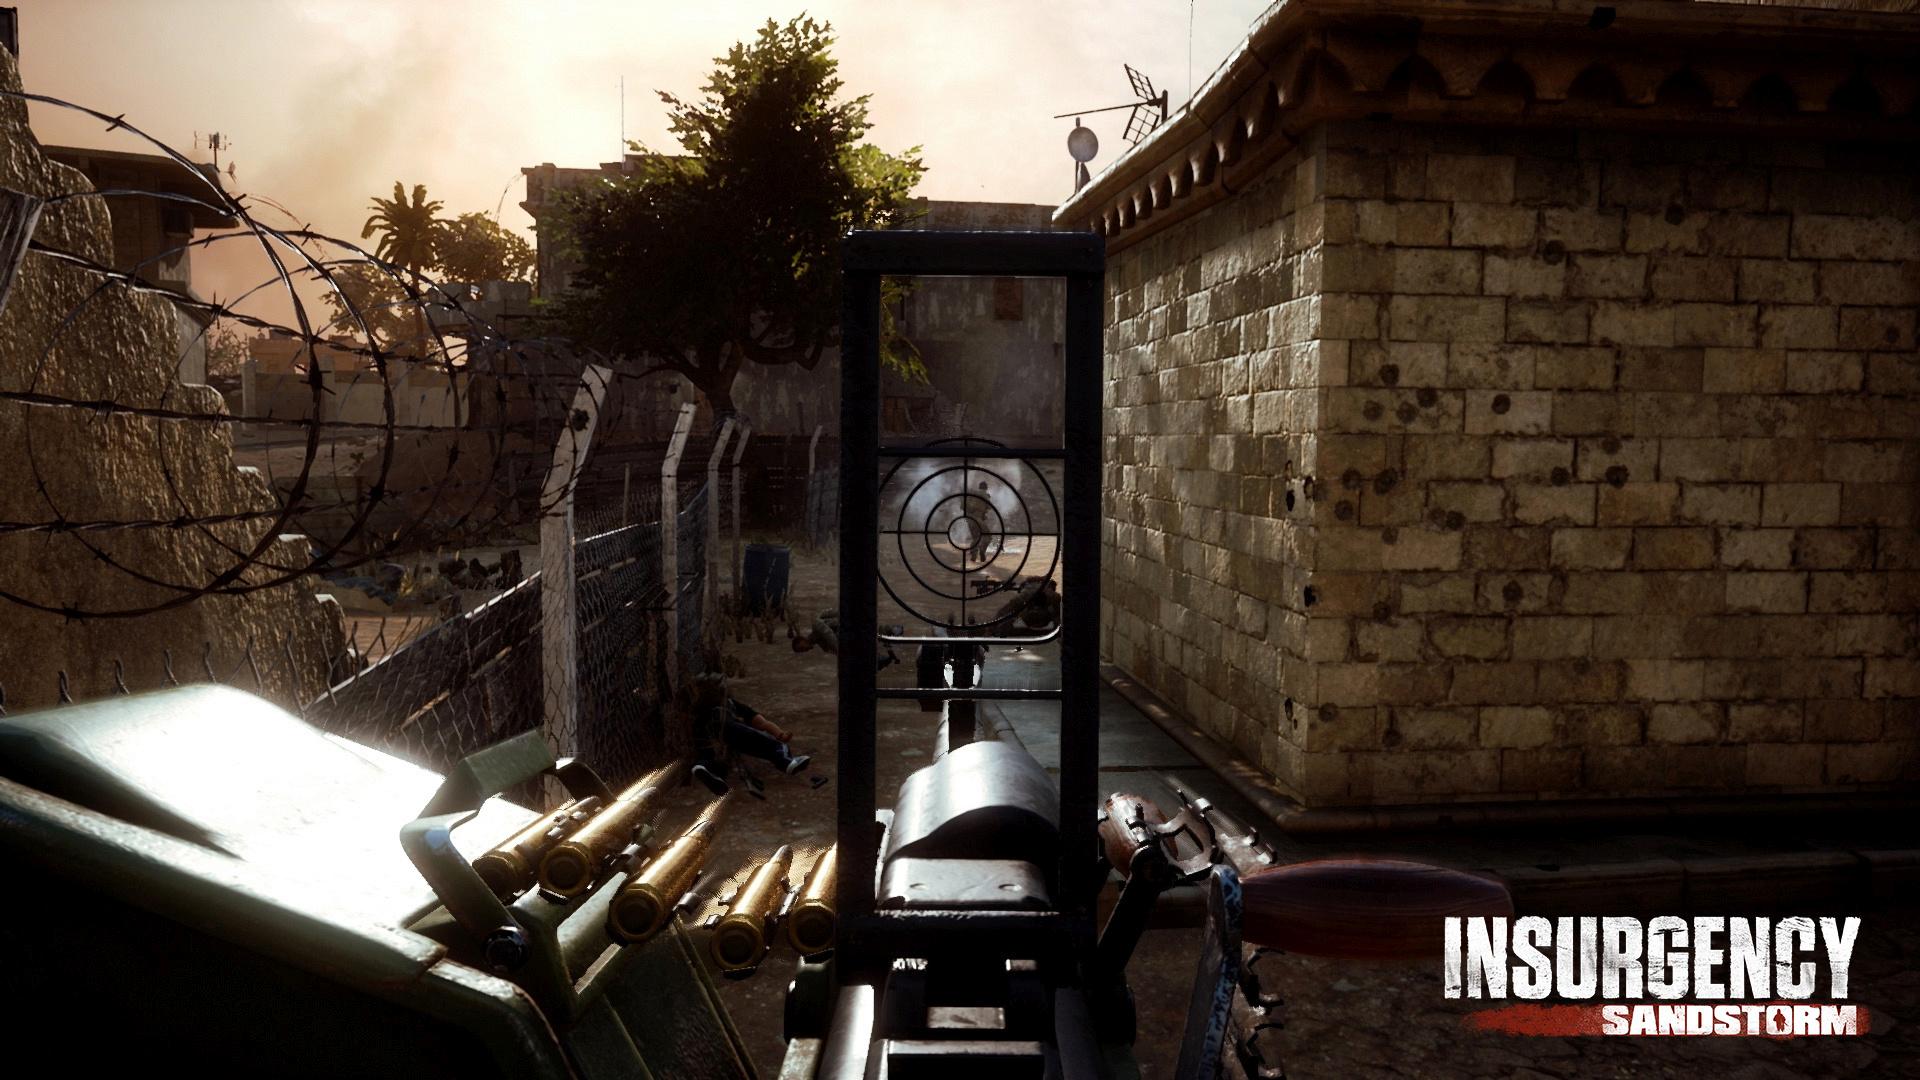 E3 2018: Sandige Schlachten im Insurgency-Sandstorm-Trailer - News    GamersGlobal.de